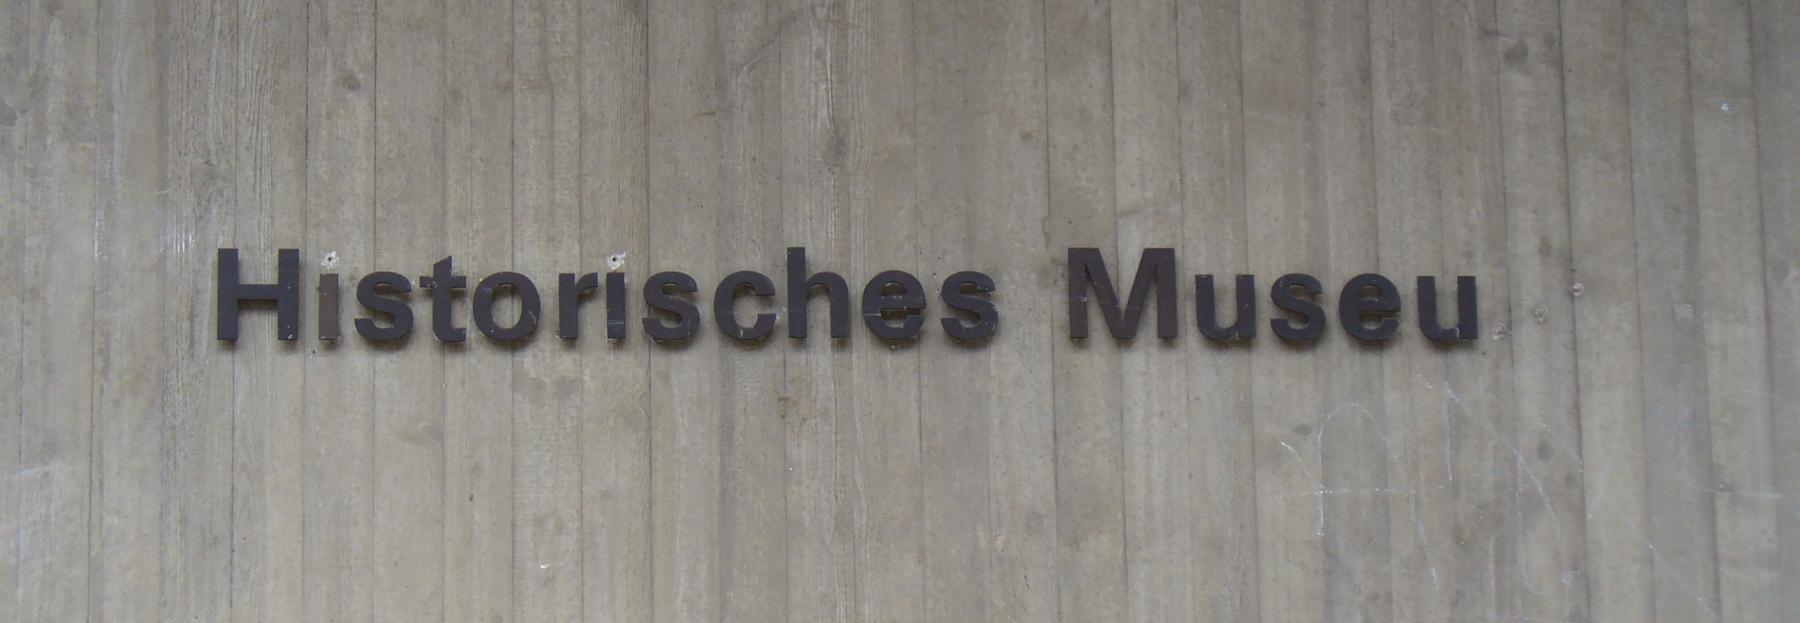 Ausschnitt der Westfassade, historisches museum frankfurt, 16.03.2011